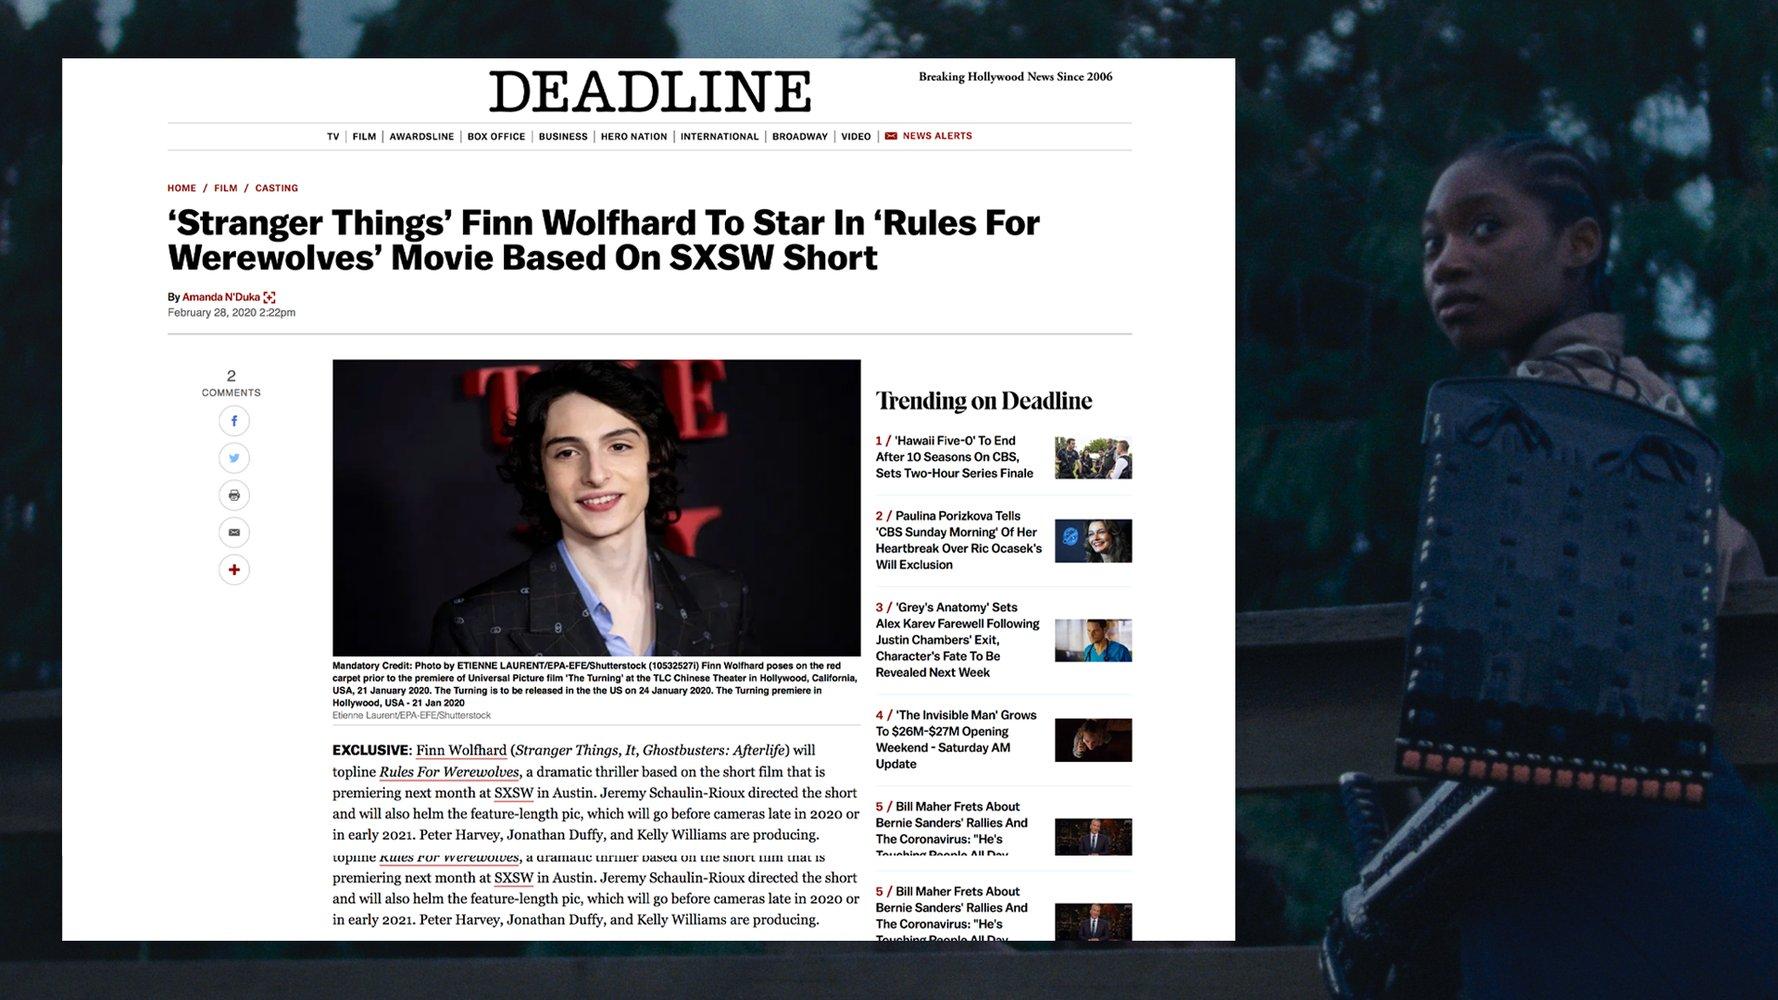 Deadline article